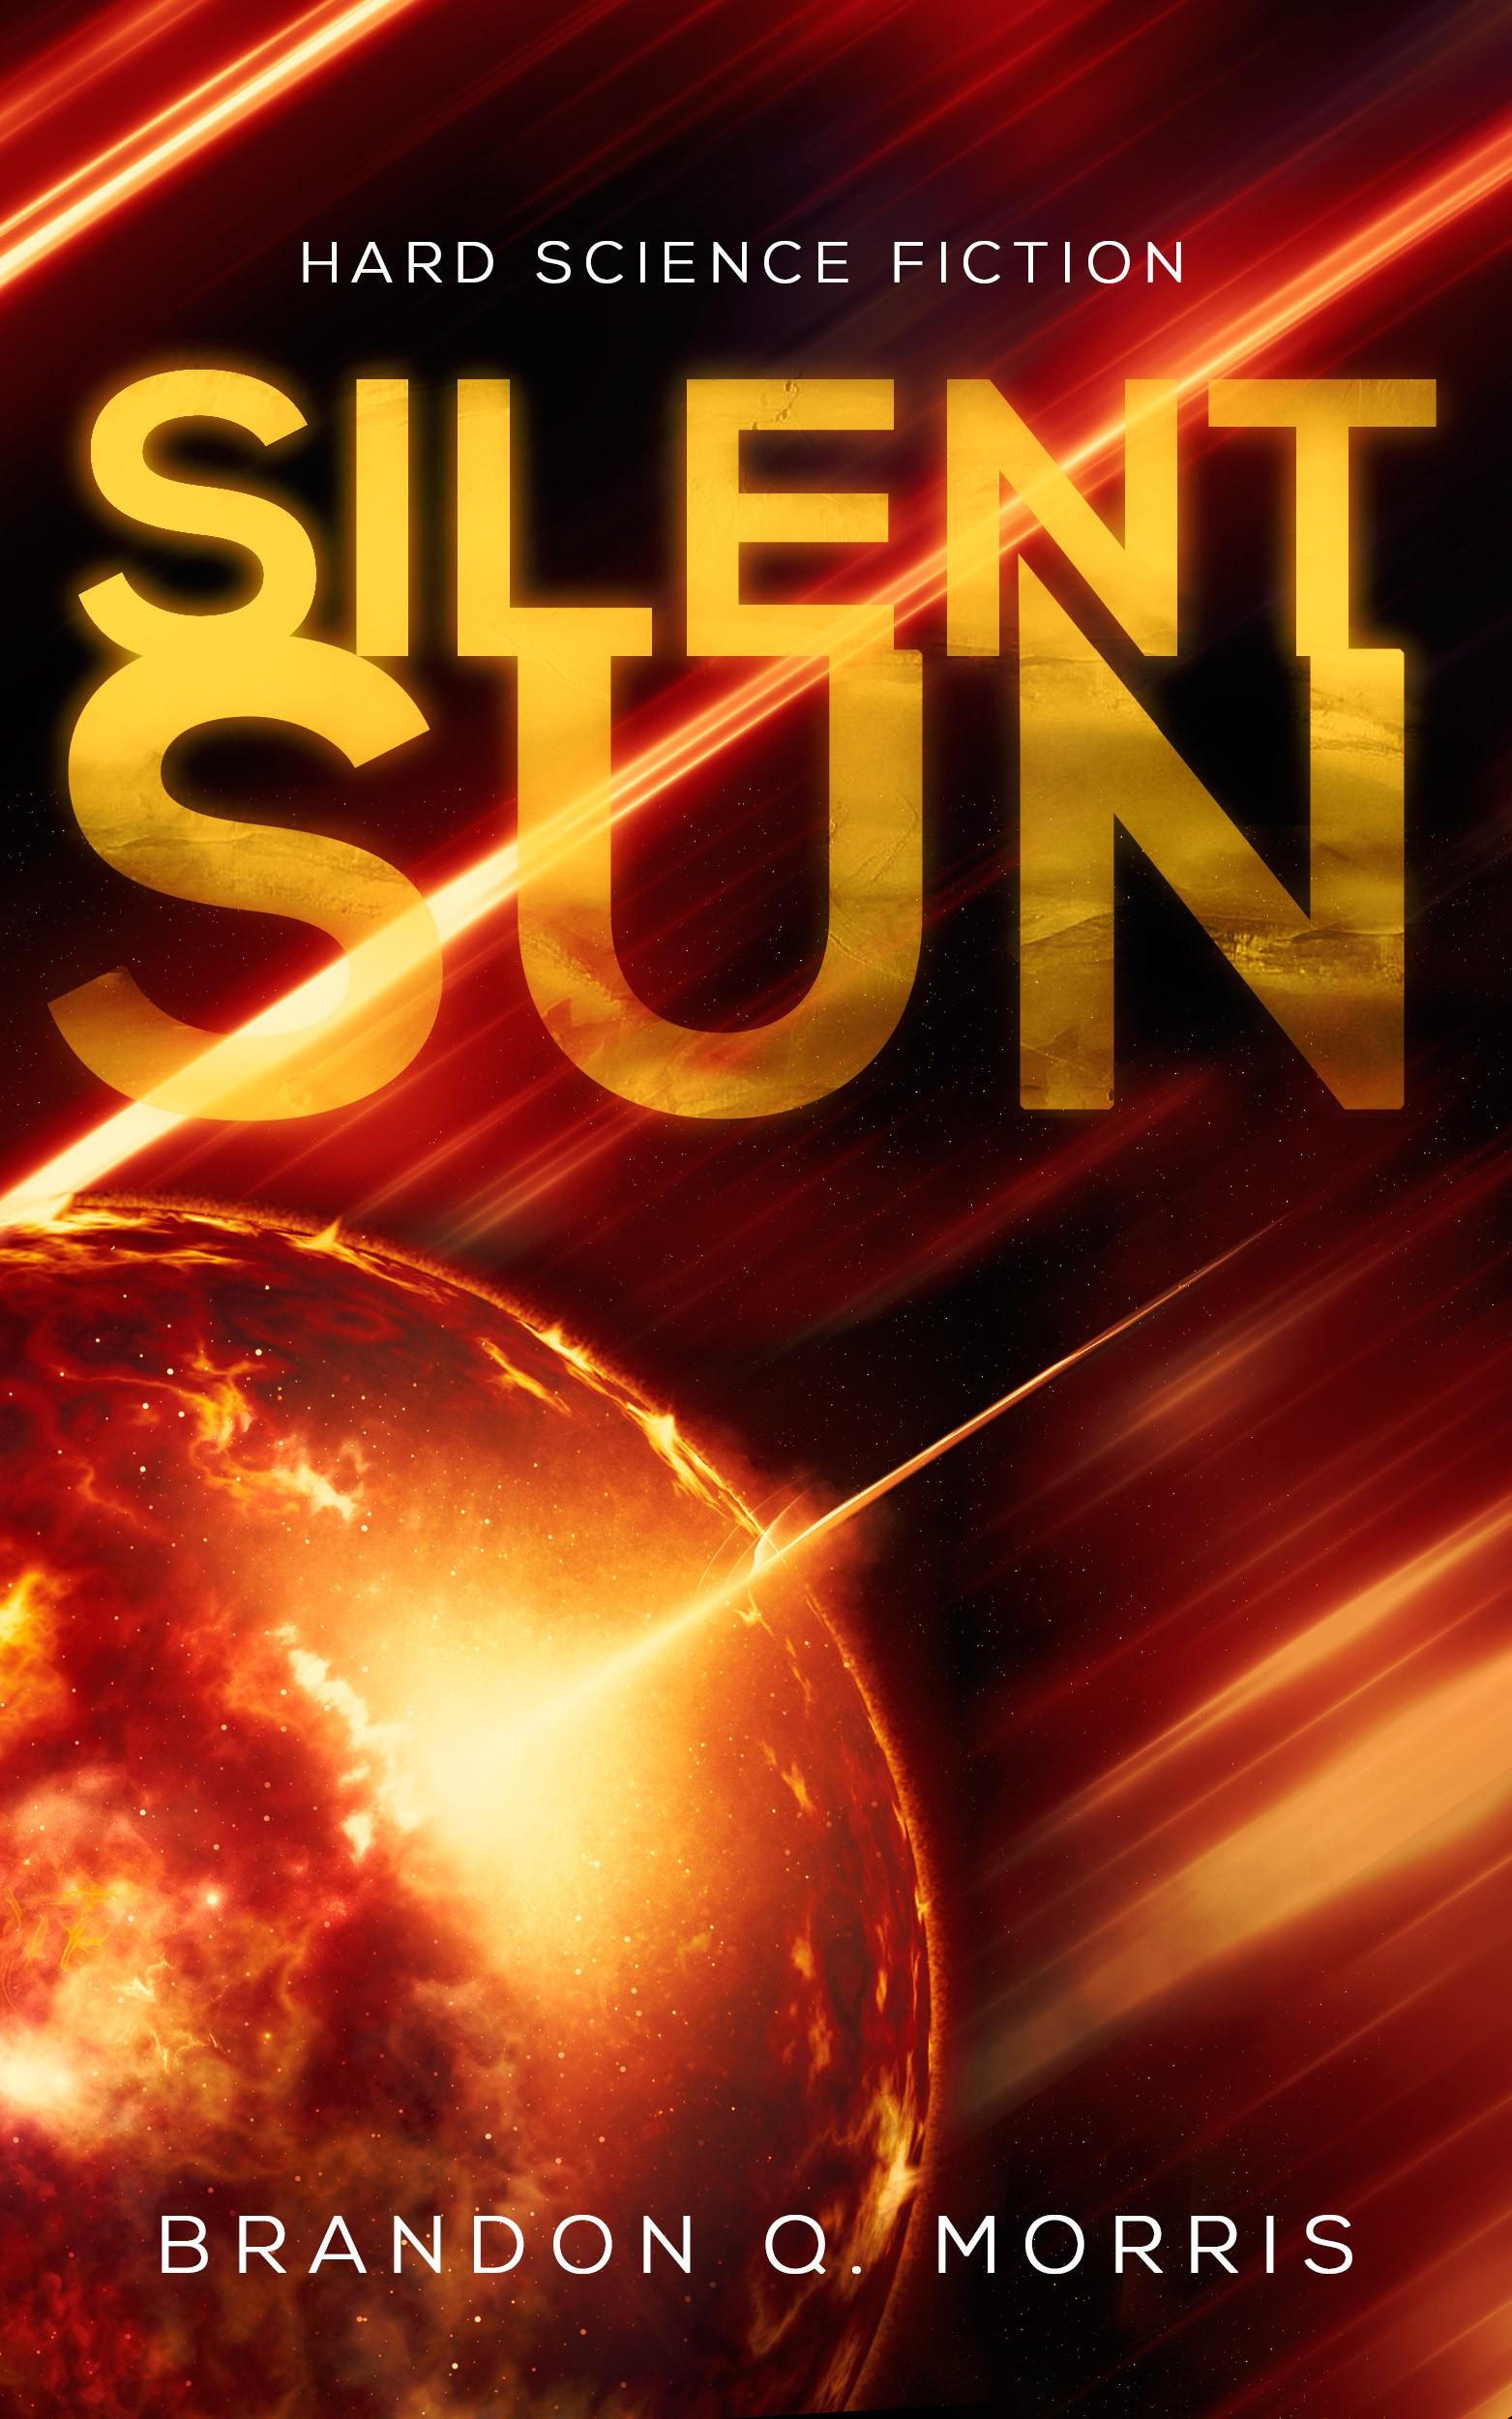 Cover for hard science fiction novel